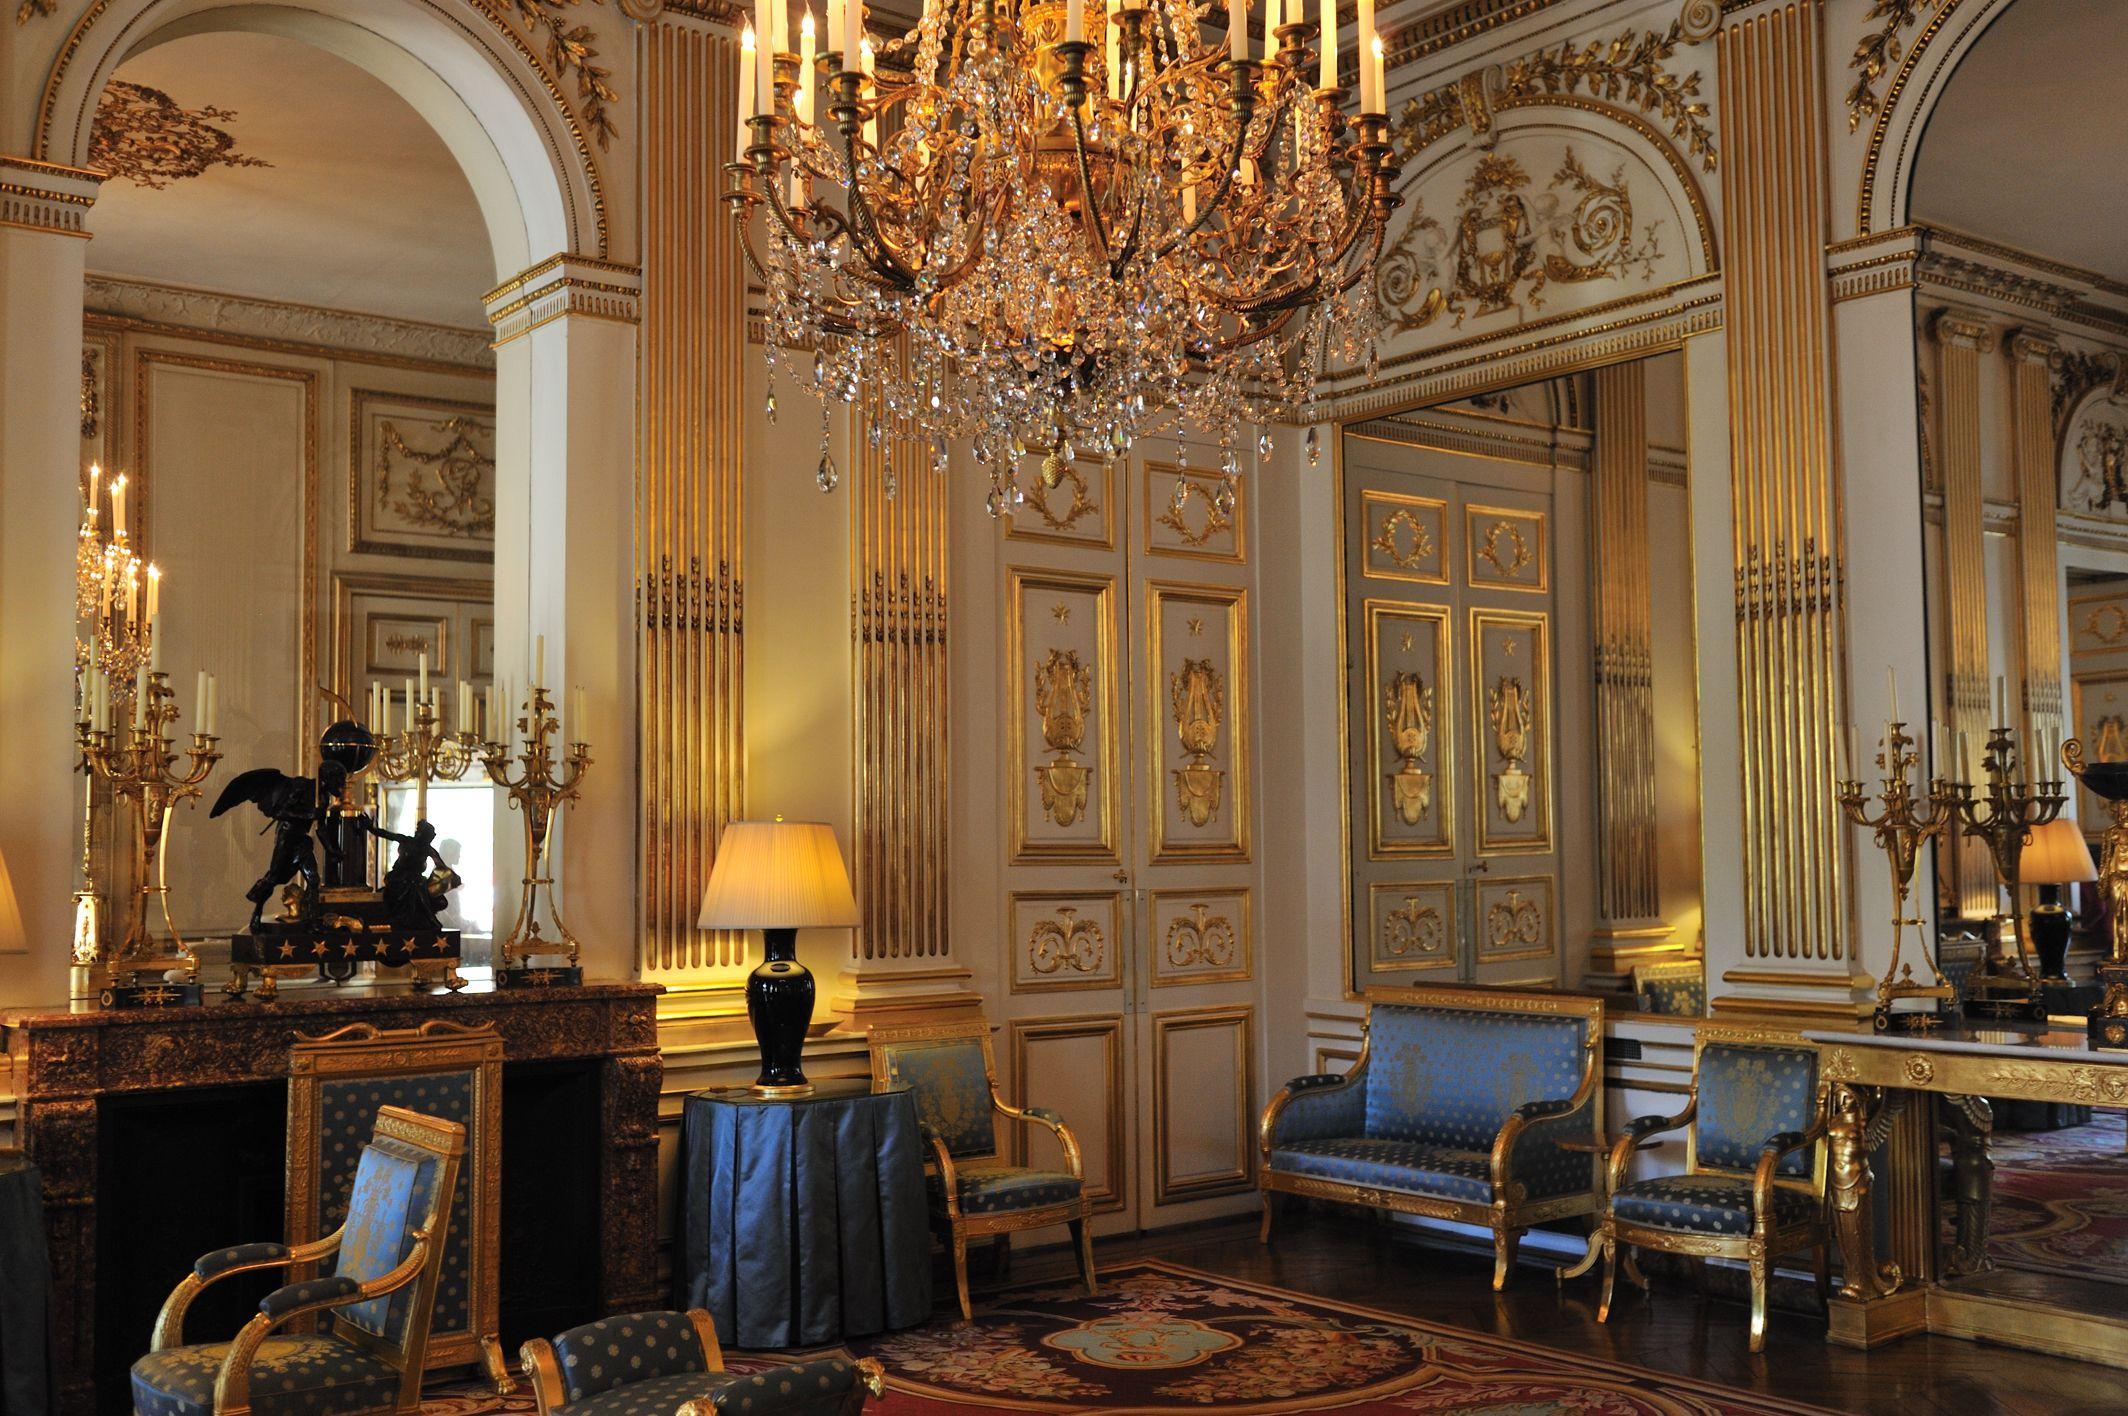 hotel de charost salon bleu 1722 25 paris now residence of hotel de charost salon bleu paris now residence of the ambassador for uk interior castle interiors